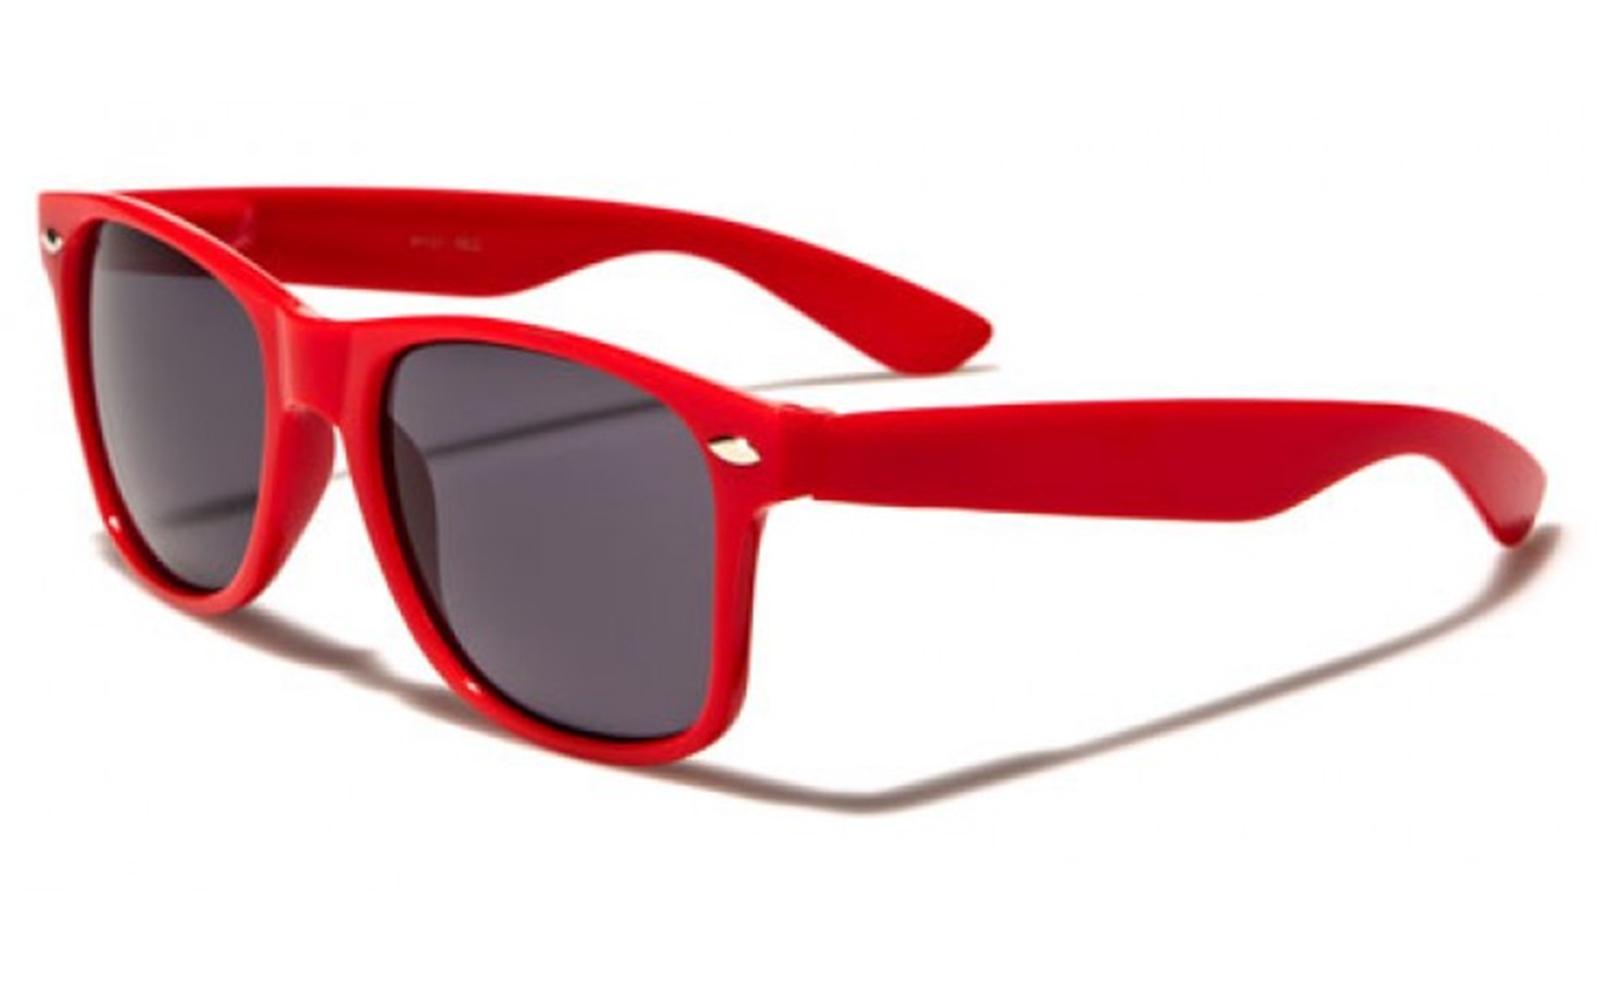 Wayfarer Sunglasses Red